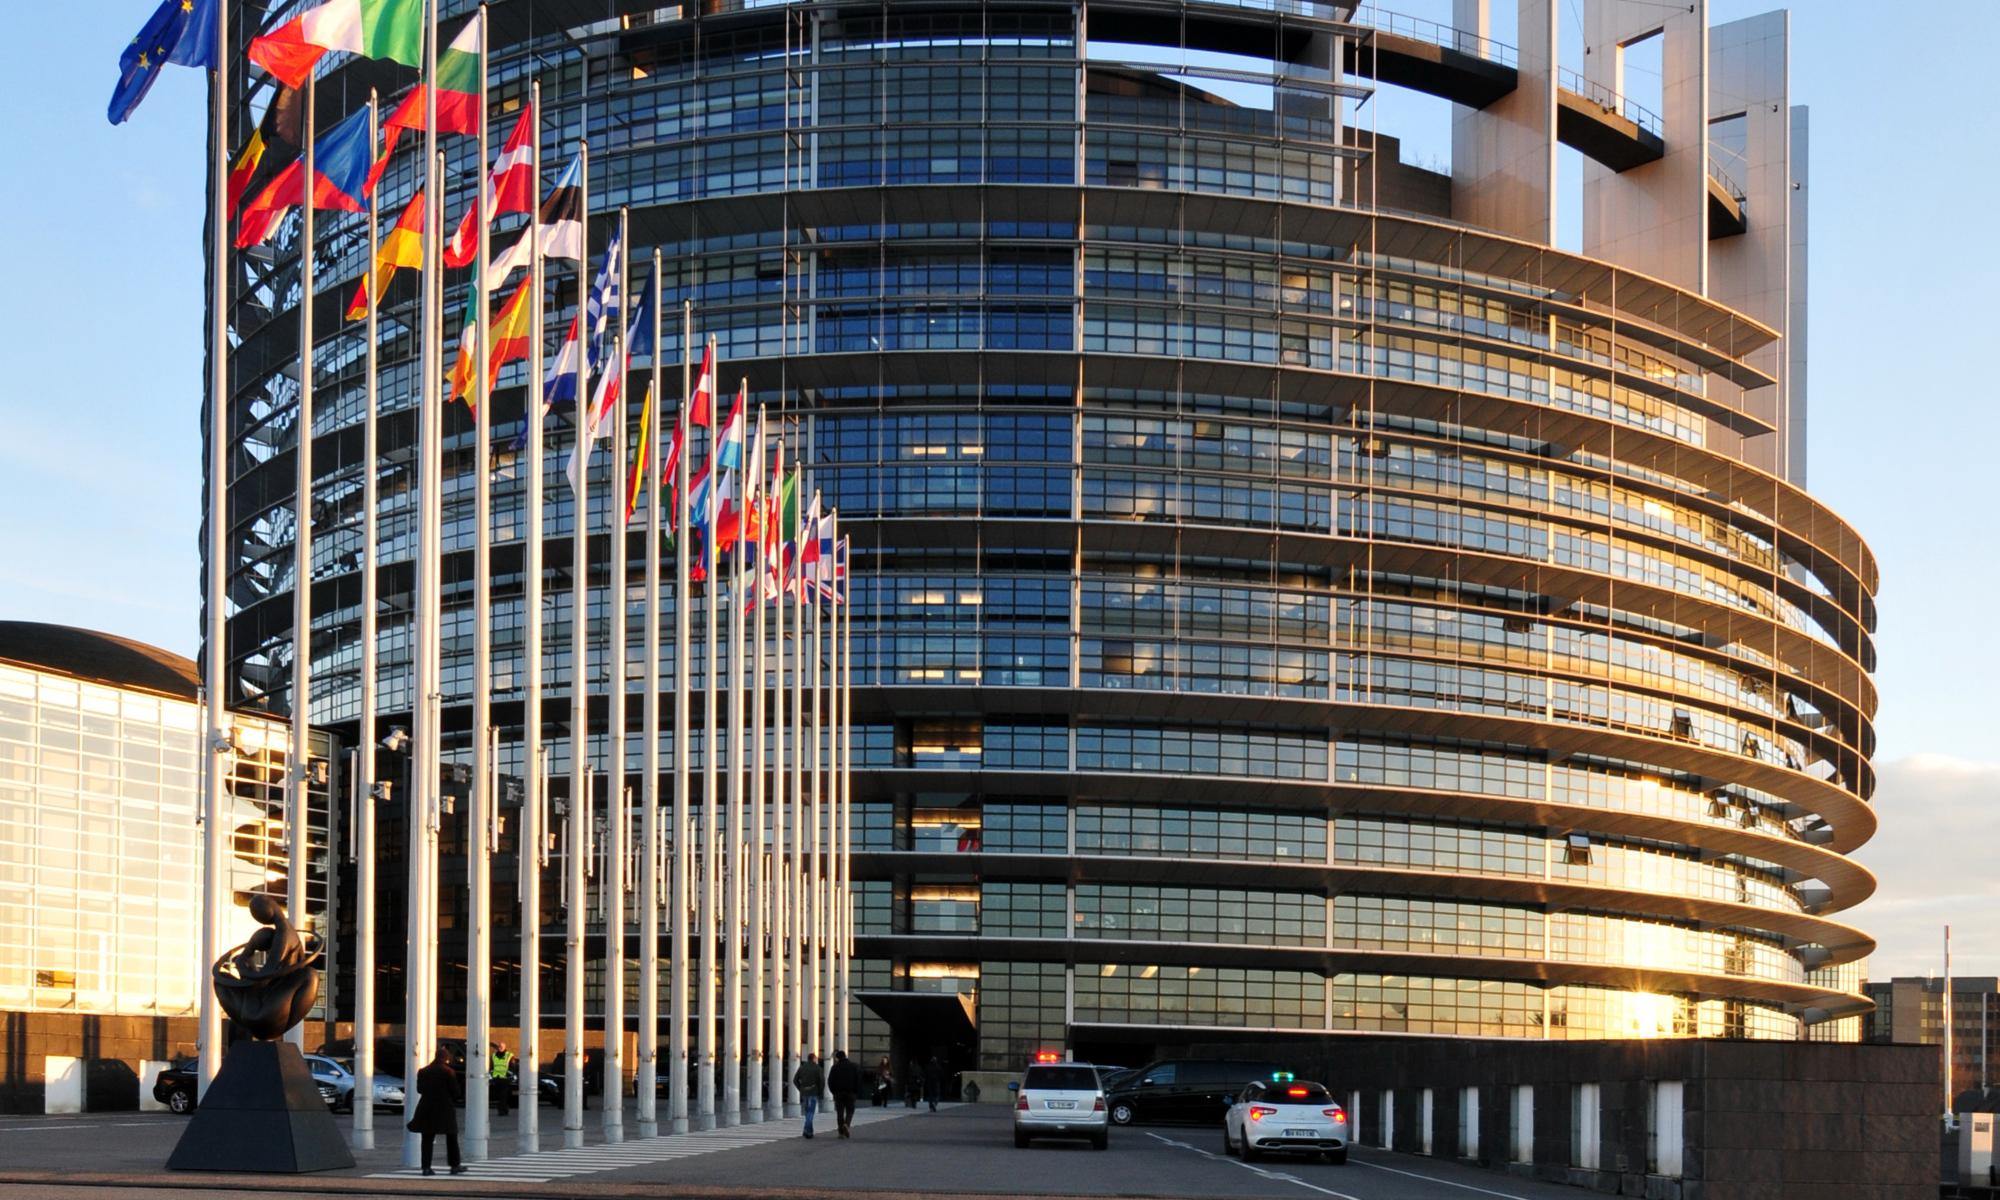 Parlamento Europeo Strasbourg